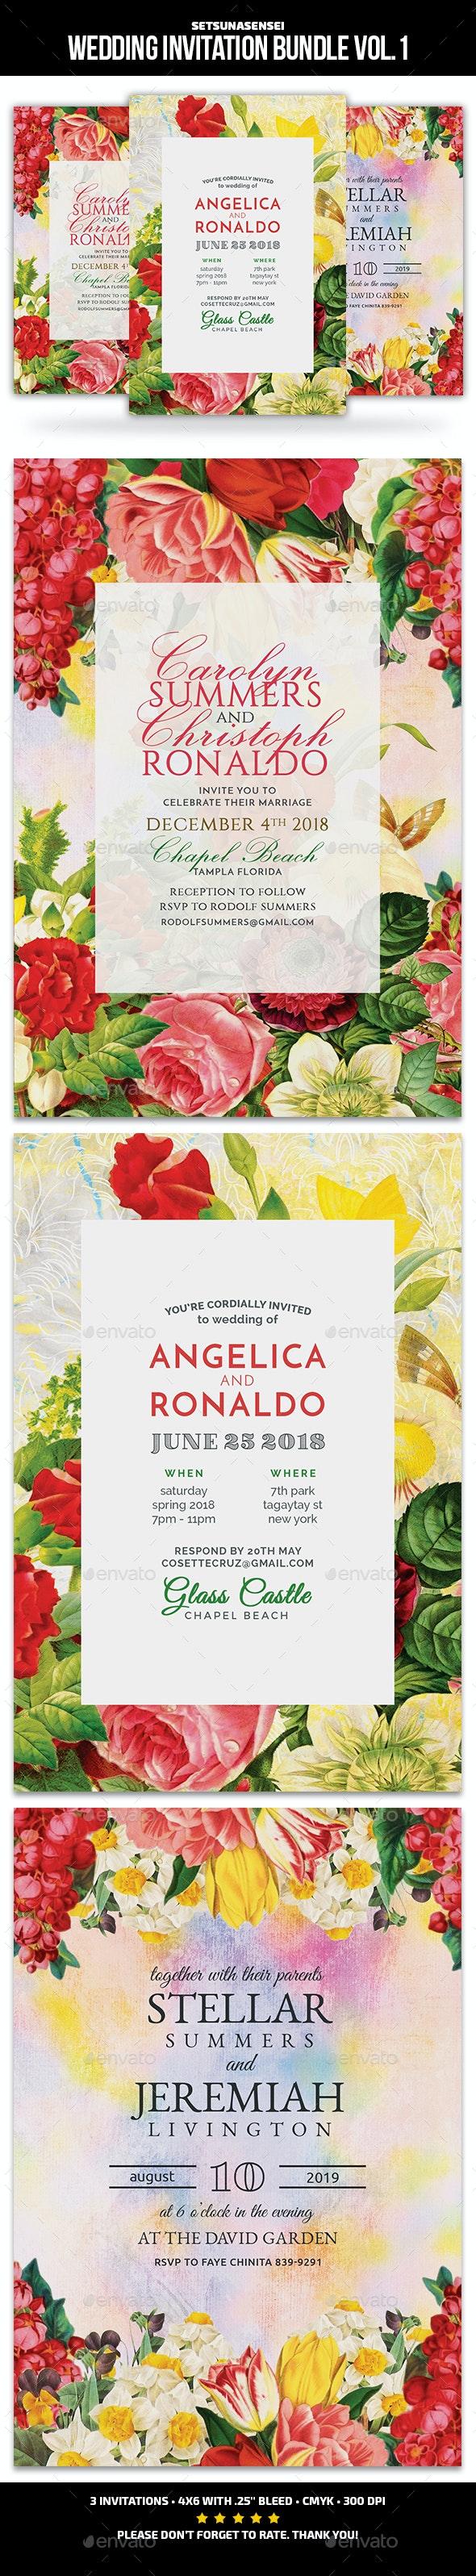 Wedding Invitation Bundle Vol. 1 - Cards & Invites Print Templates